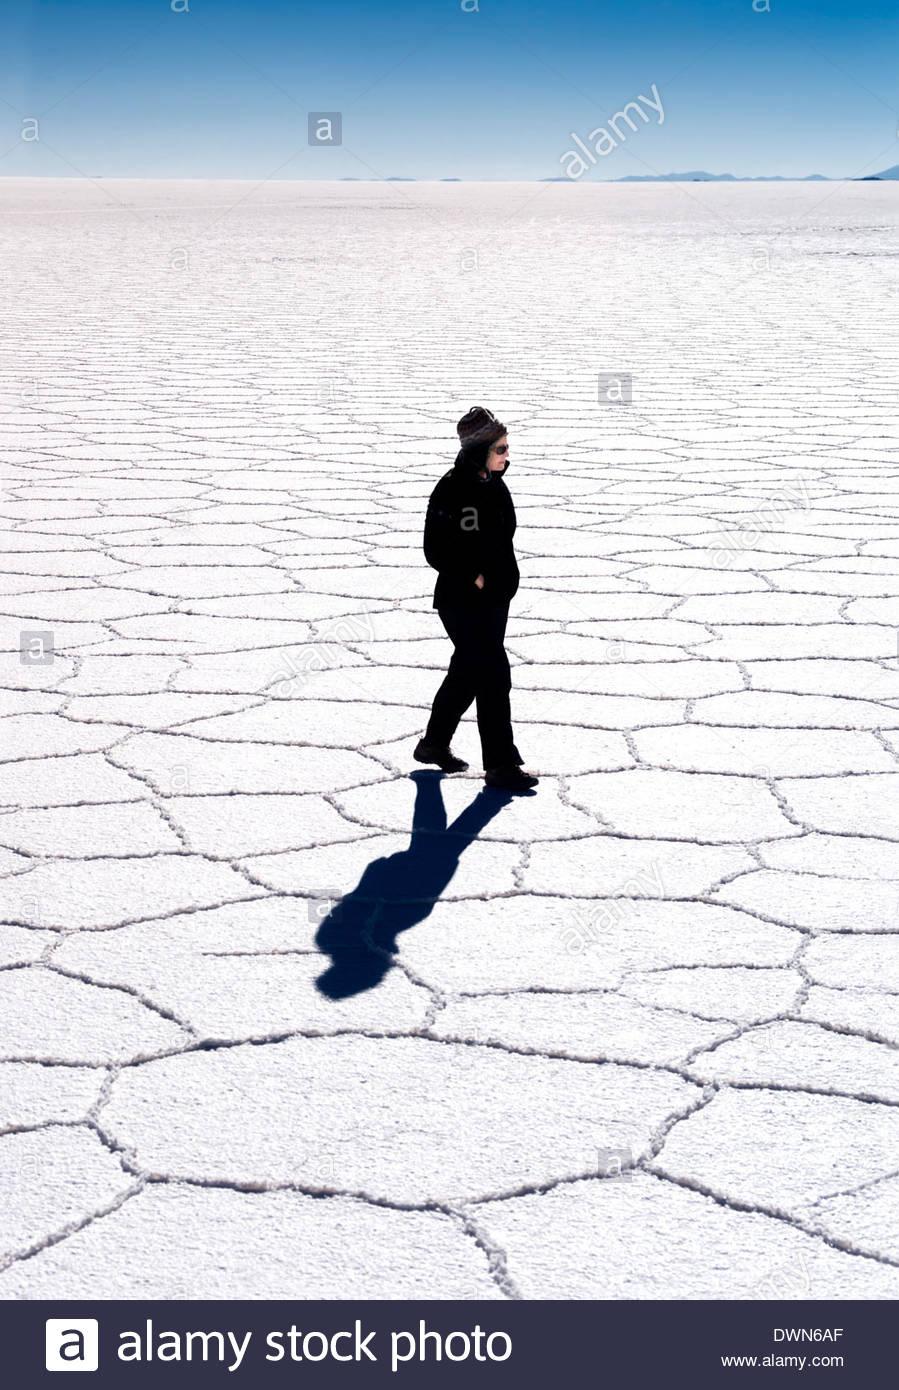 Woman walking across hexagonal patterns on salt flats, Salar de Uyuni, Bolivia, South America - Stock Image